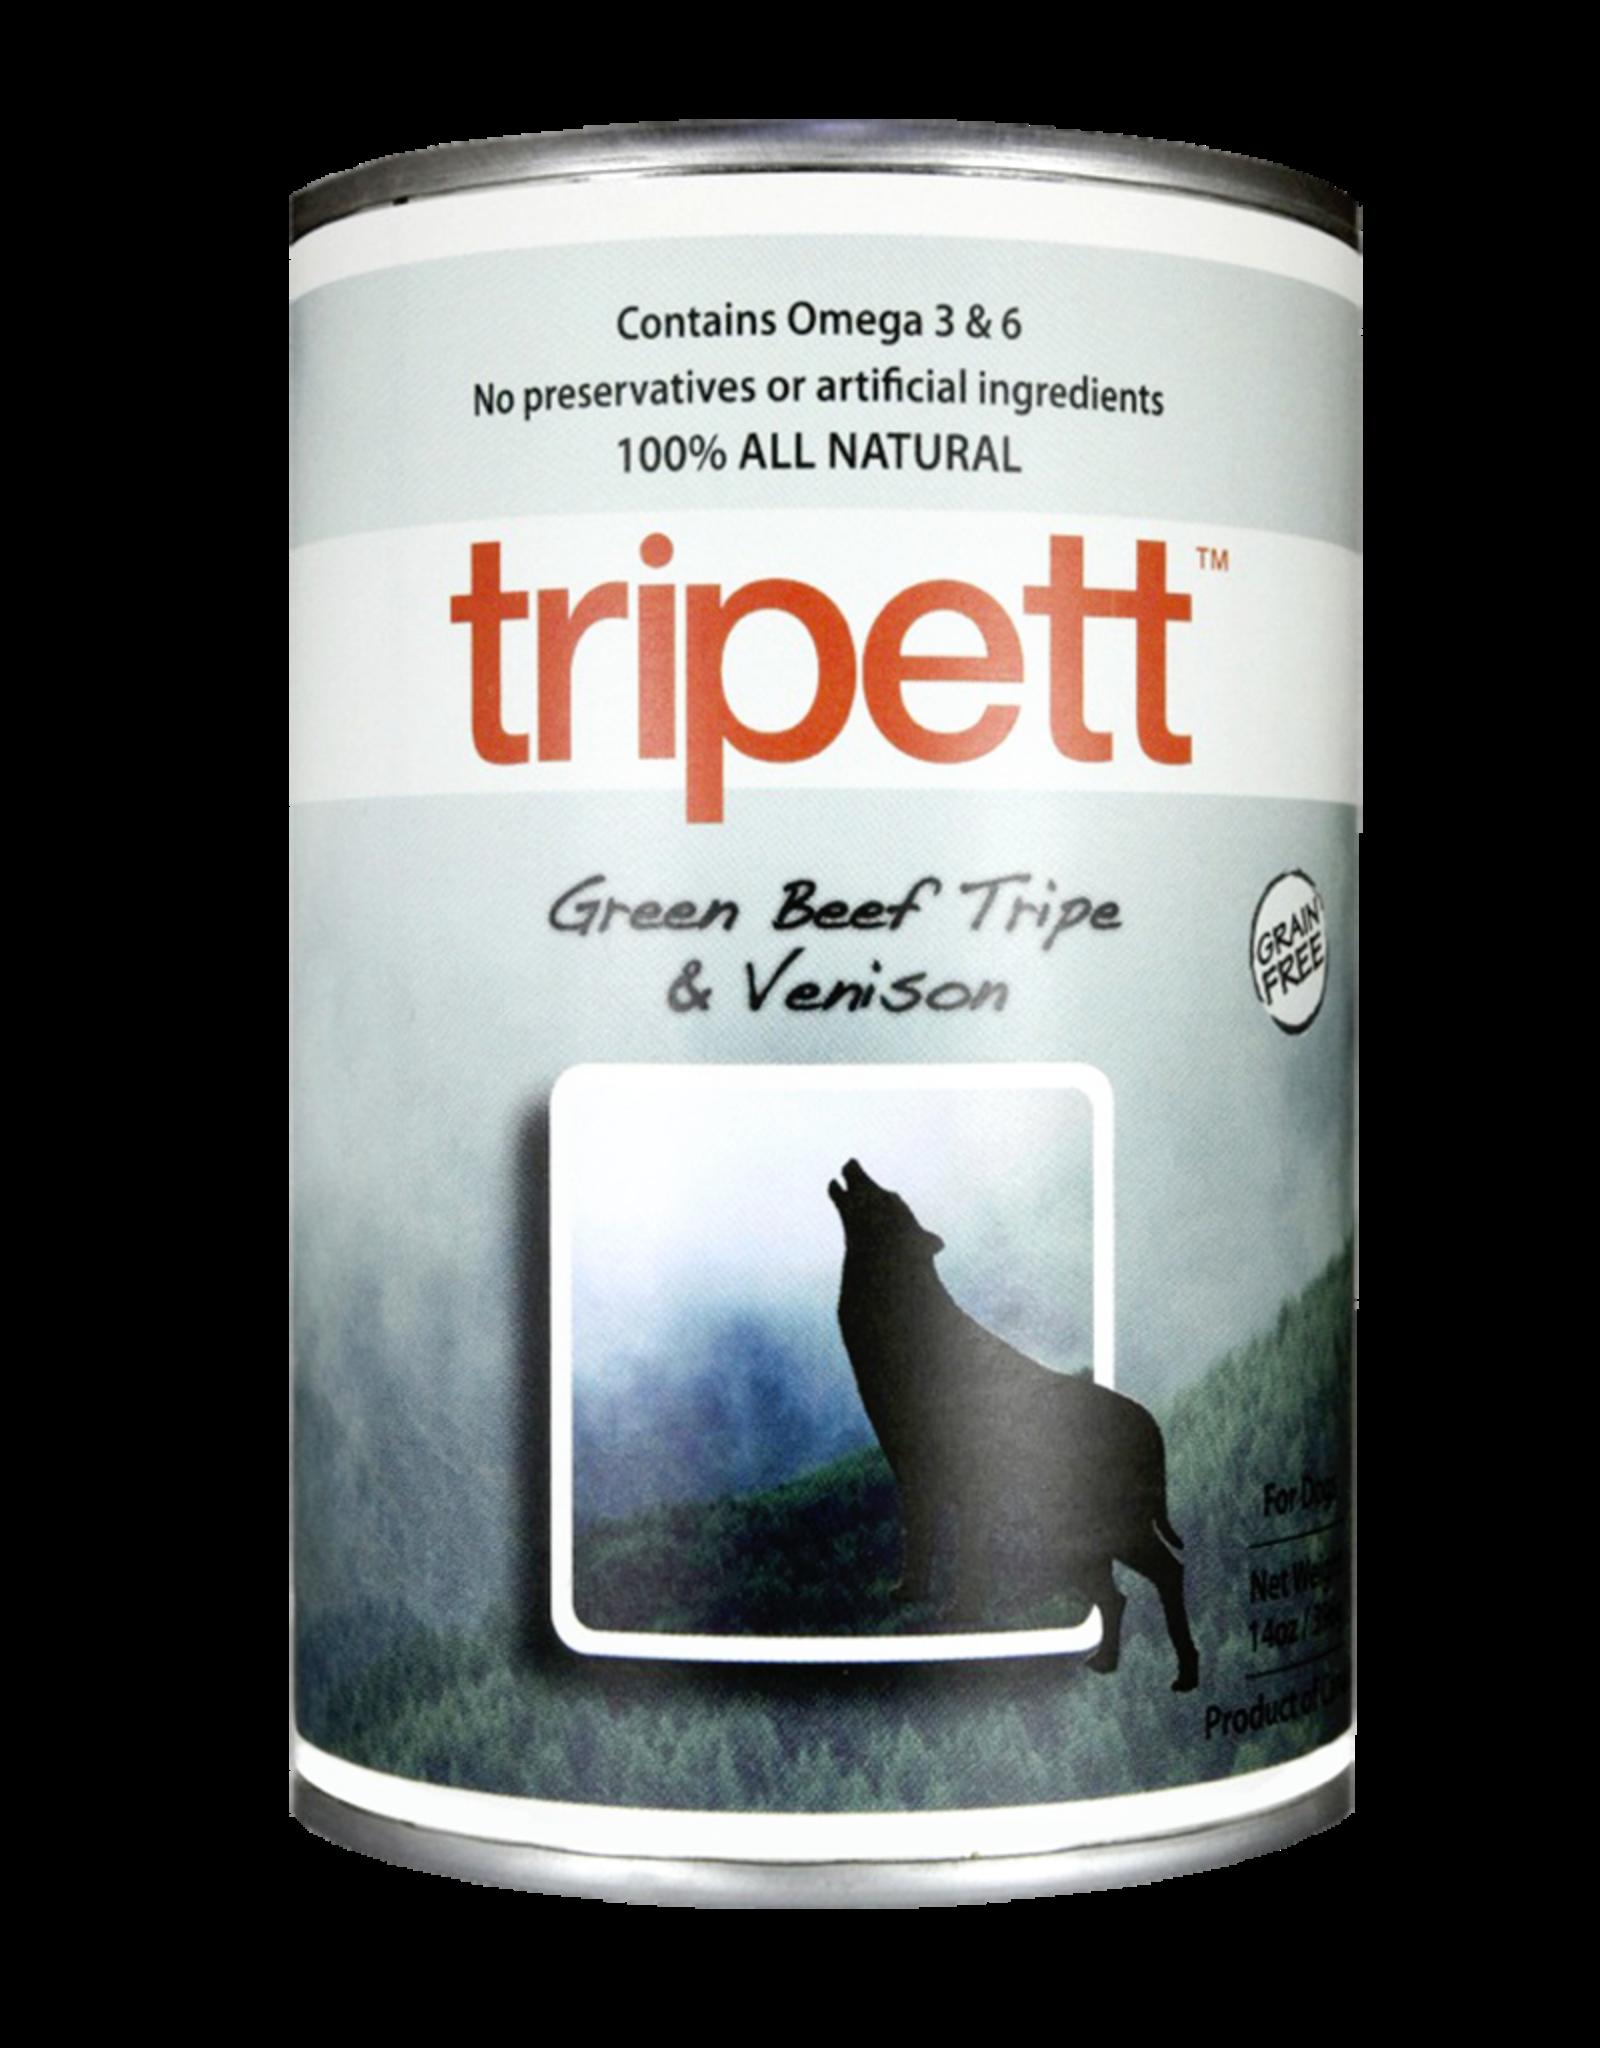 PetKind Dog Green Beef Tripe & Venison Tripett - Grain-Free 12.8oz